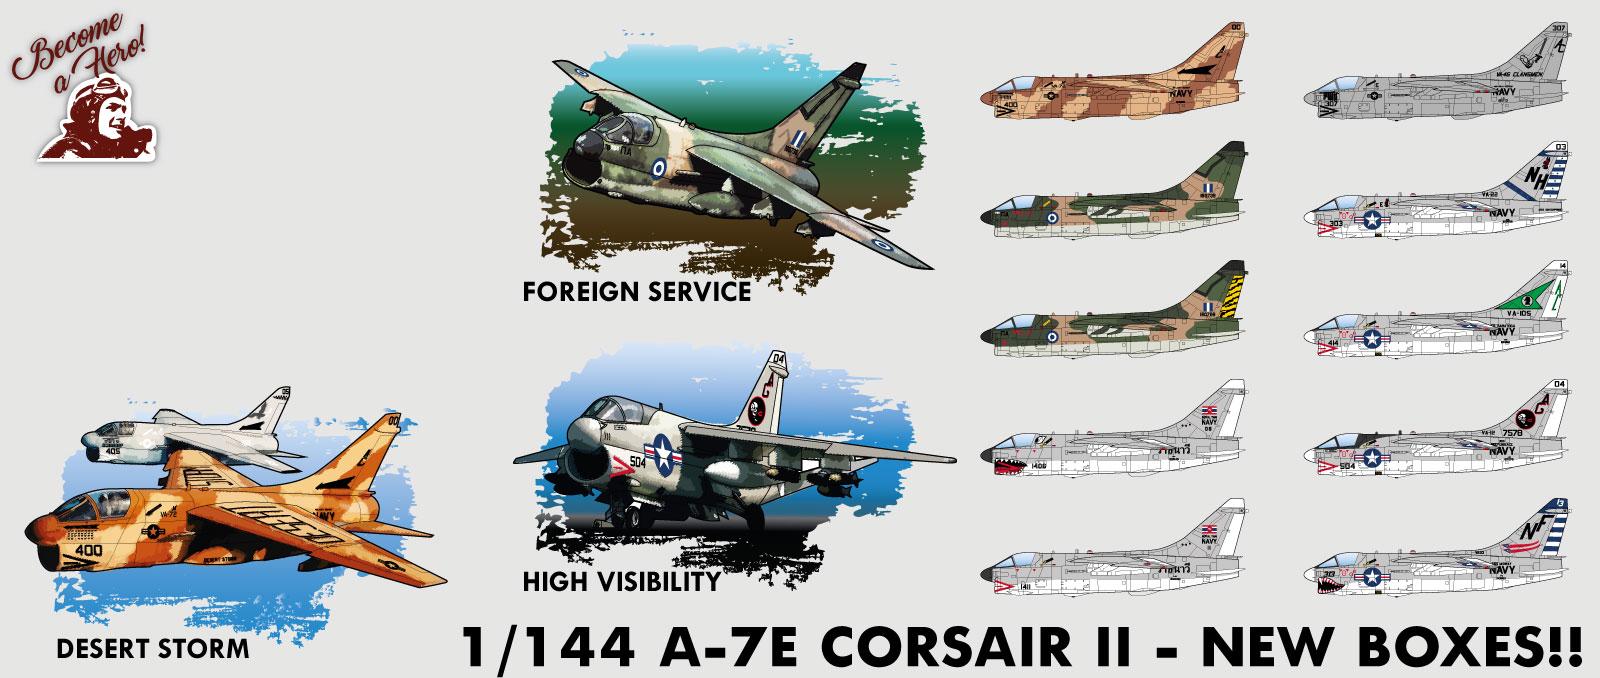 Corsairkitnew